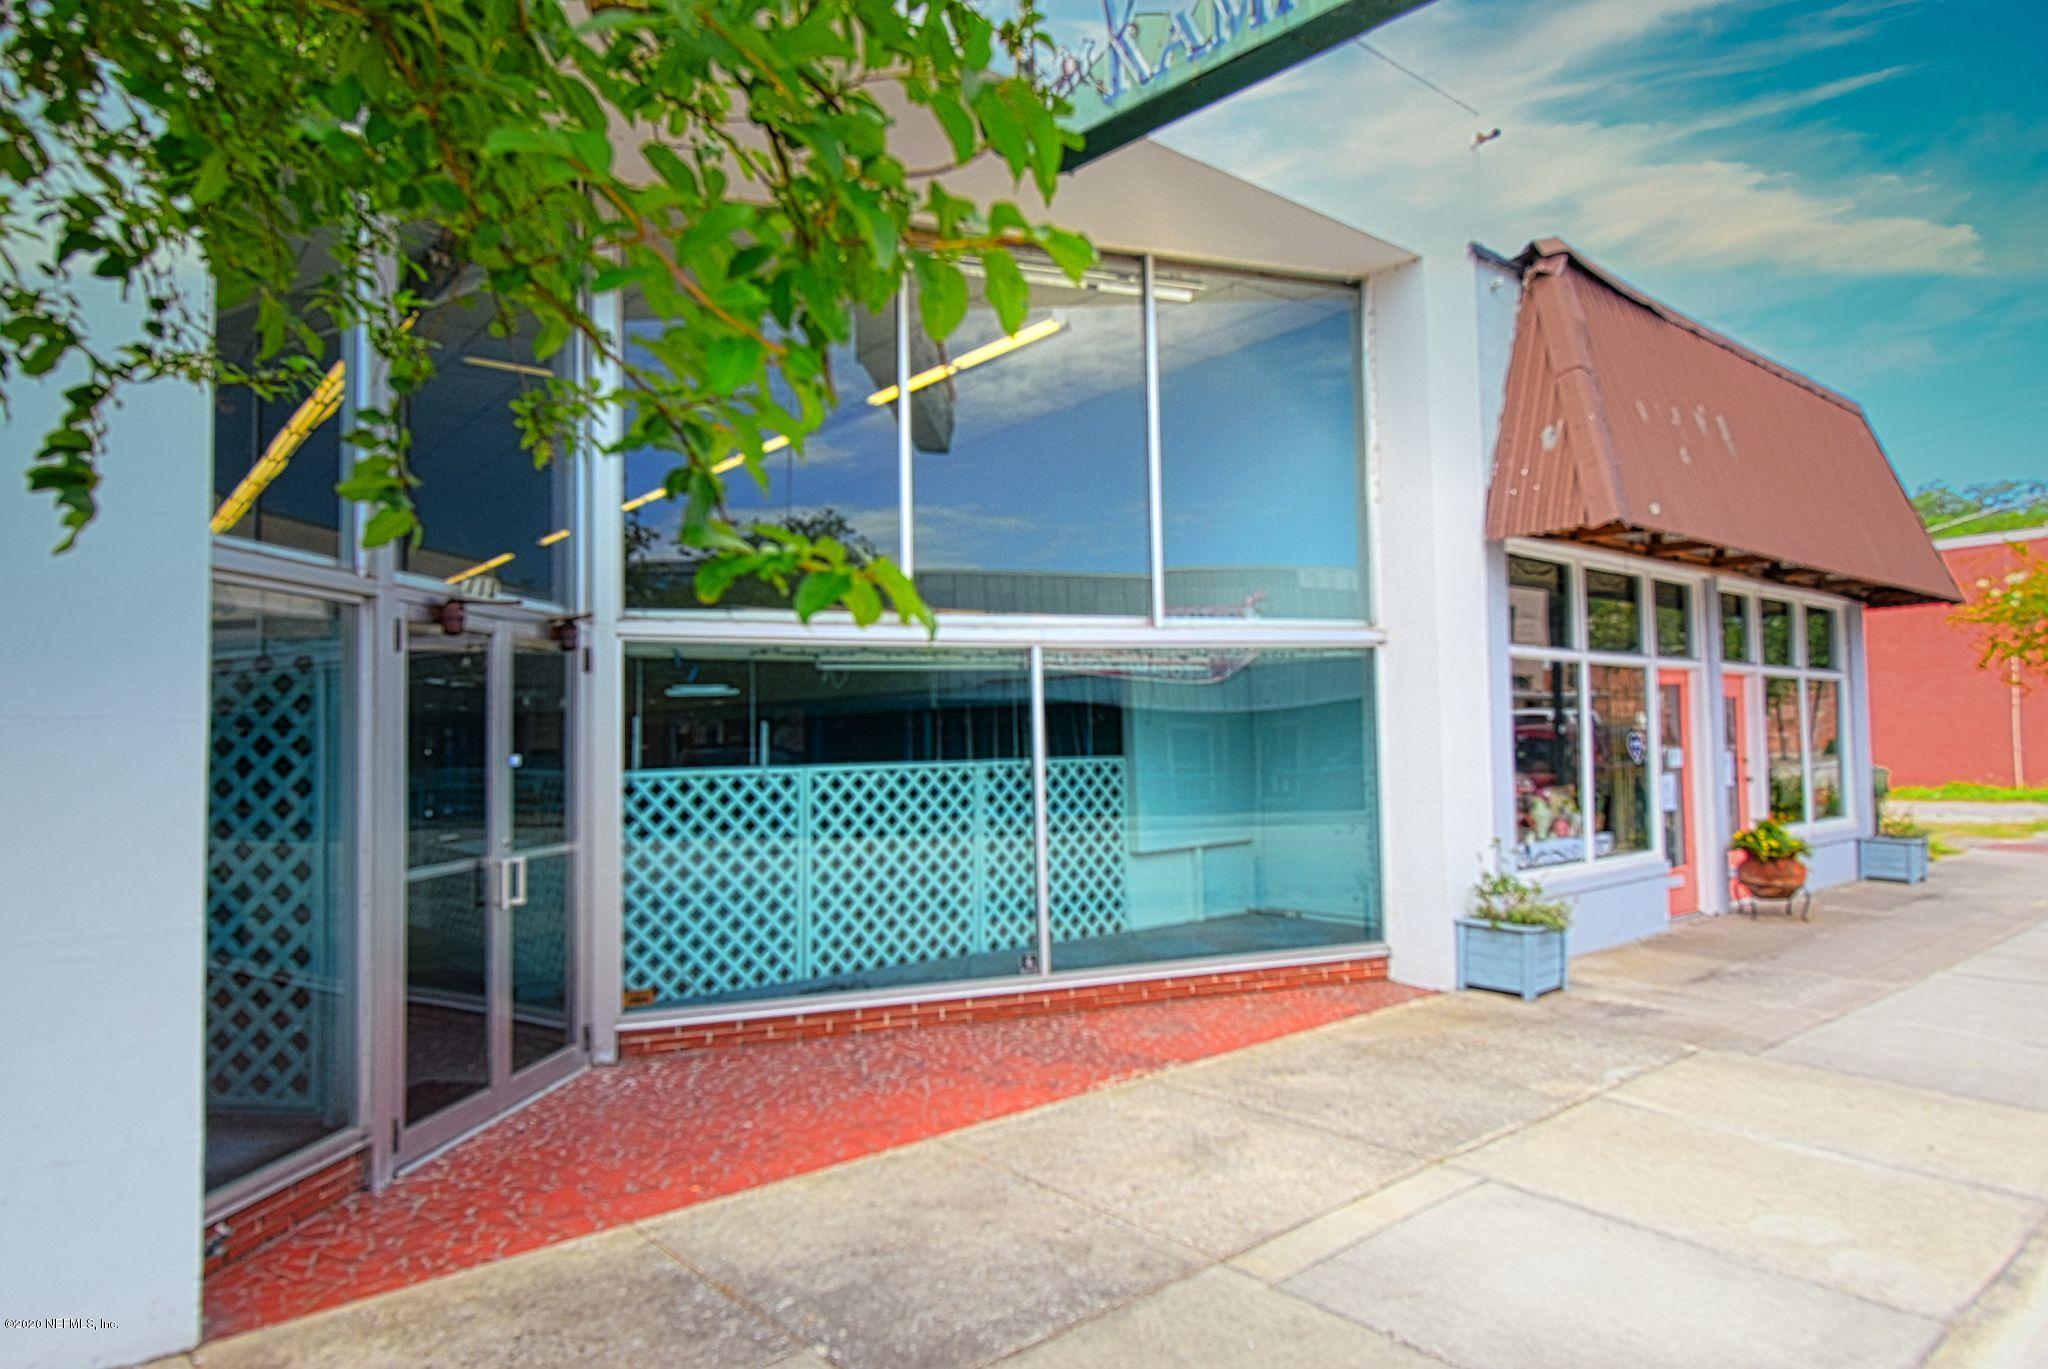 715 ST JOHNS, PALATKA, FLORIDA 32177, ,Commercial,For sale,ST JOHNS,1053630